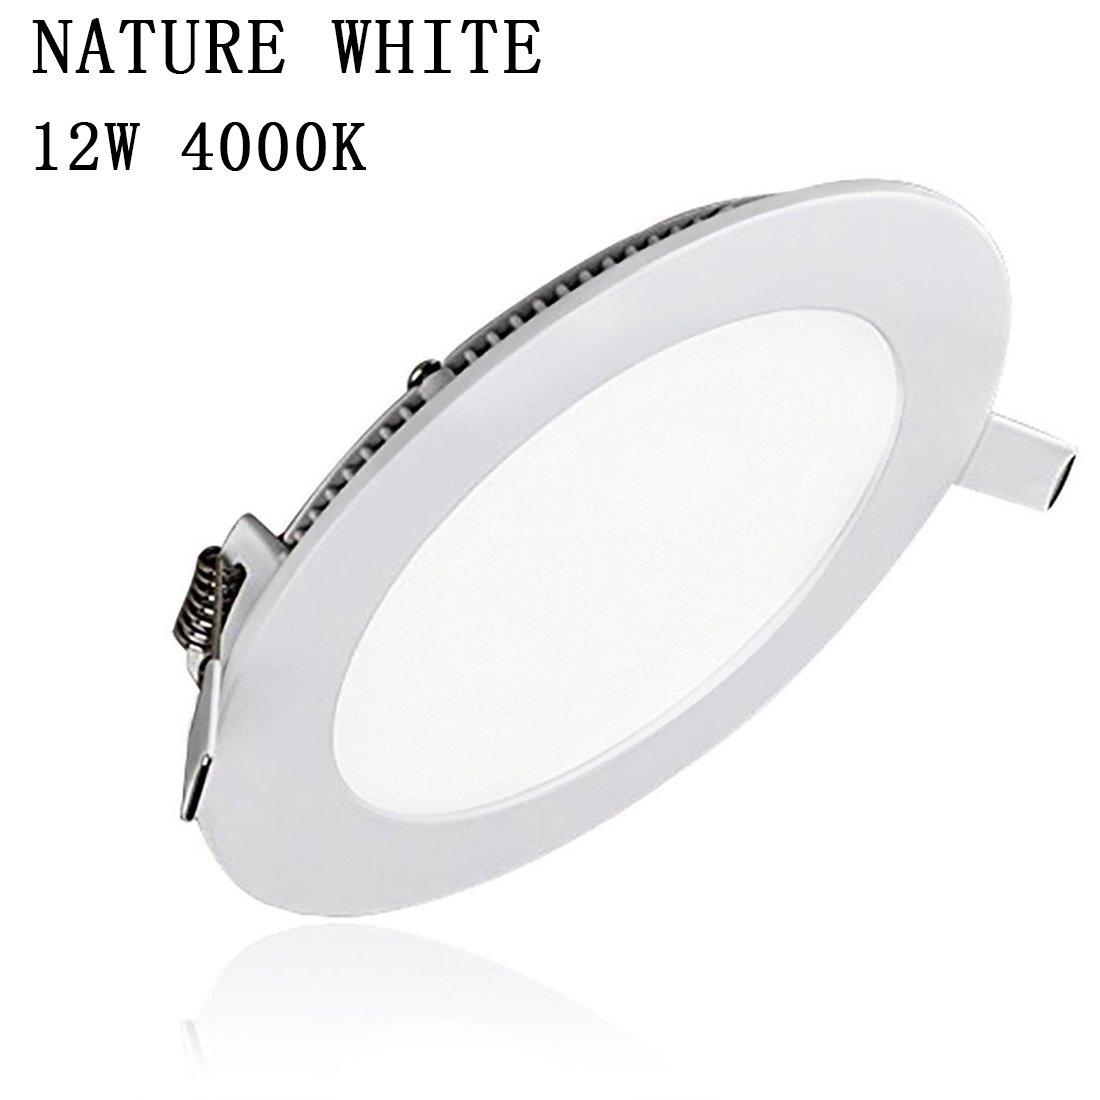 Placa LED Circular Super Slim Downlight LED Energía Empotrable Placa Techo 6W 4000K Luz Neutra 220V XYD® [Clase de eficiencia energética A+]